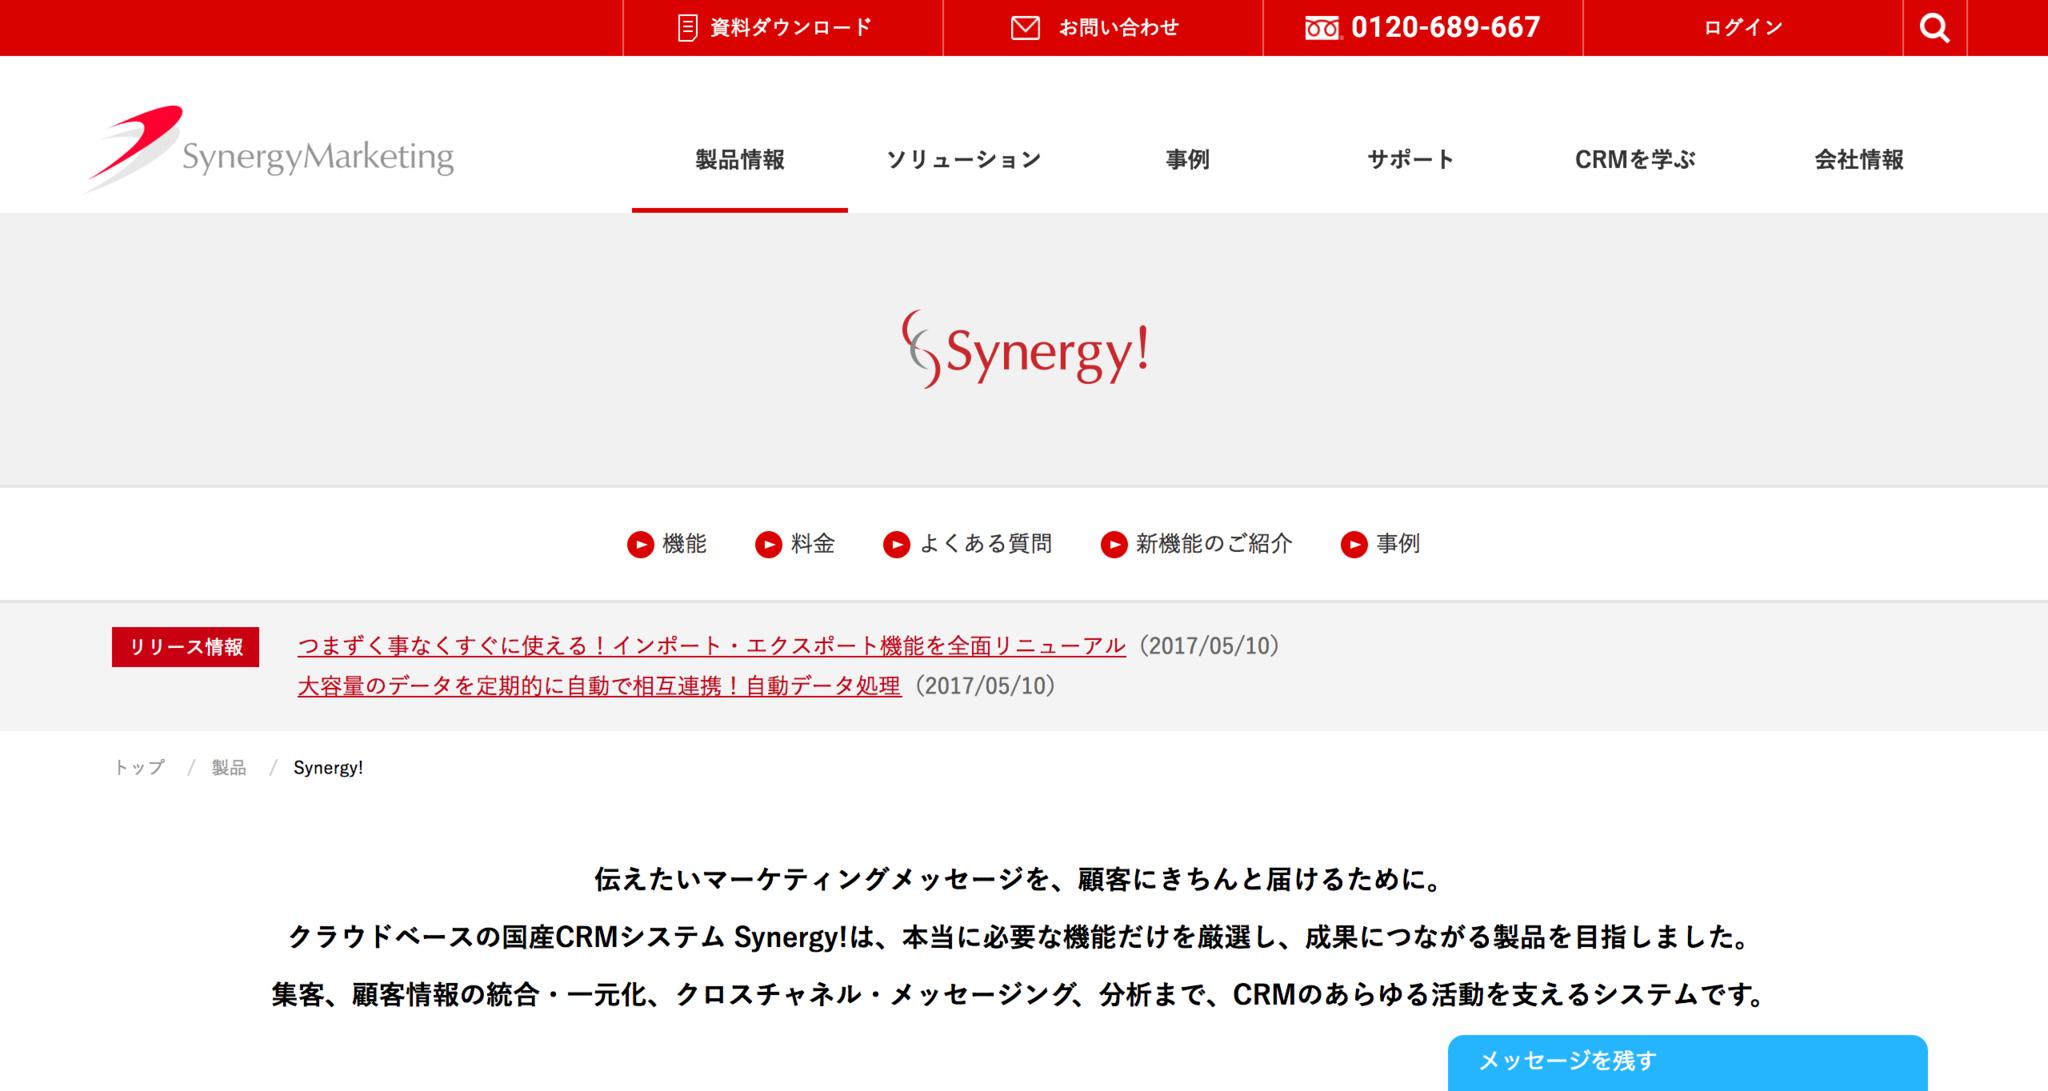 Synergy____CRM・顧客管理システム___シナジーマーケティング株式会社.png